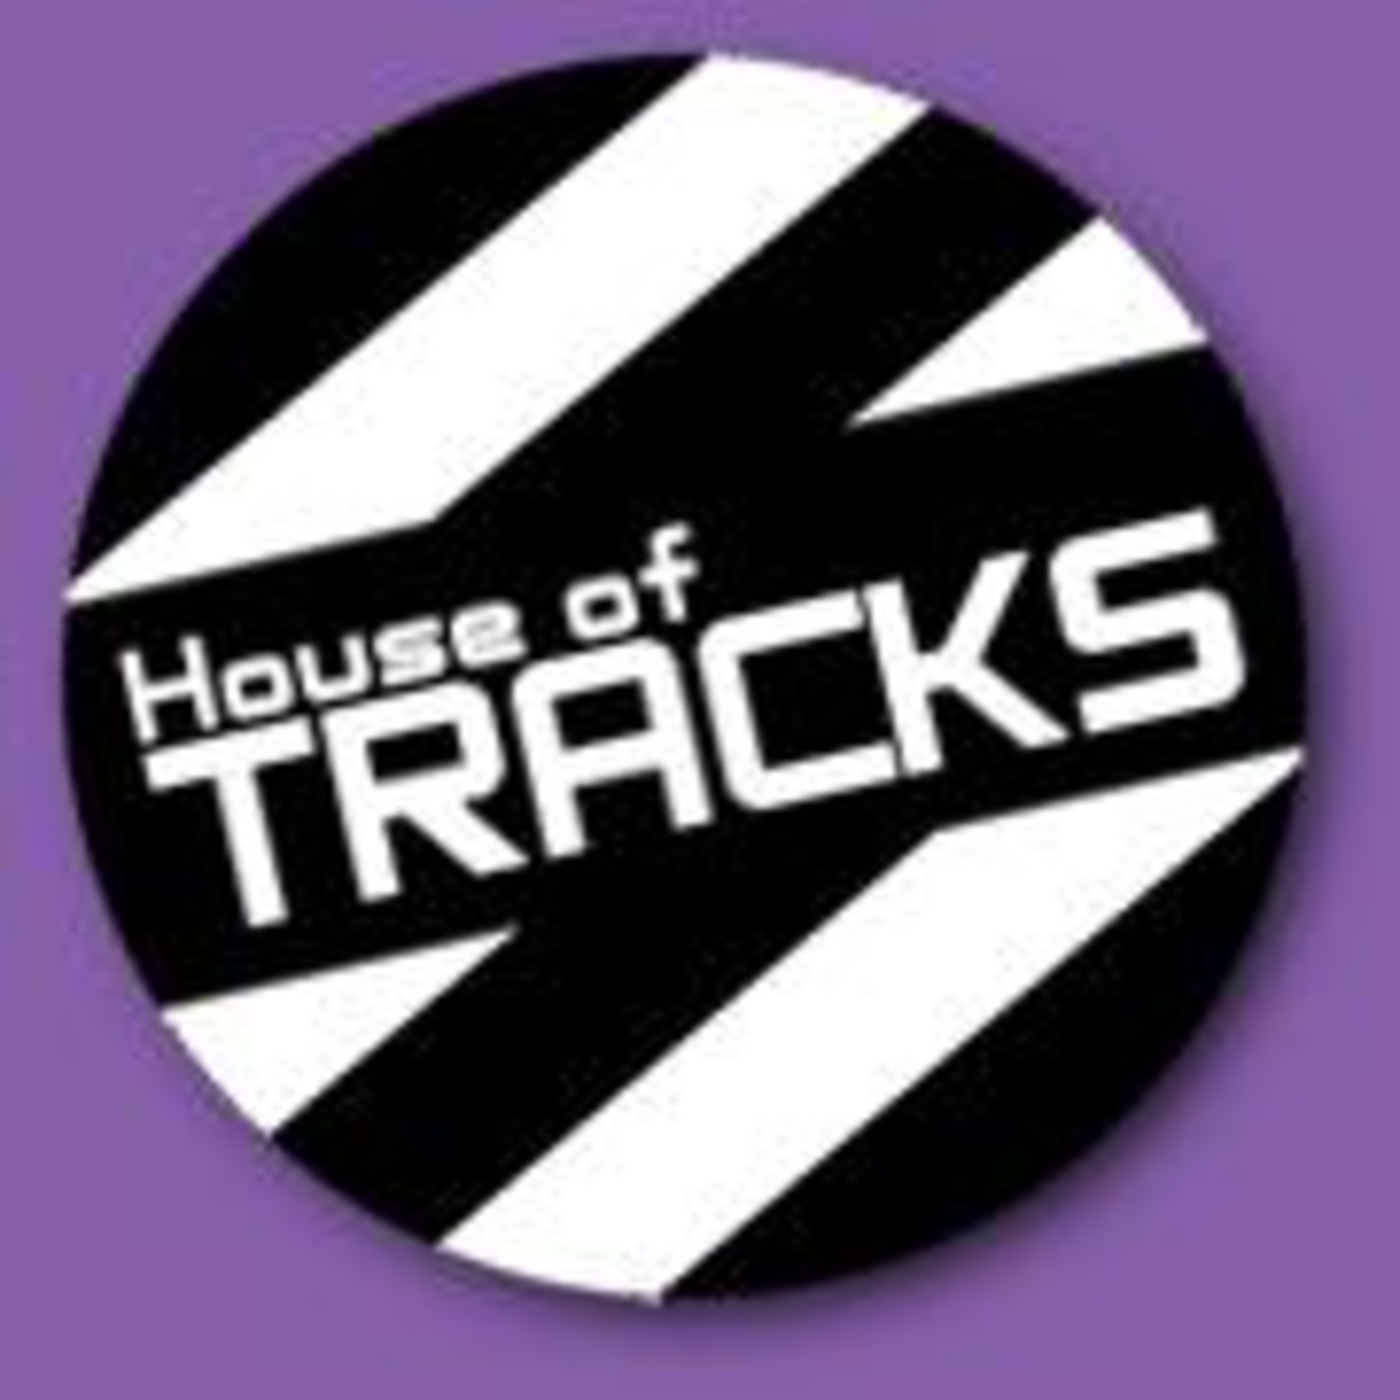 House Of Tracks Podcast Three